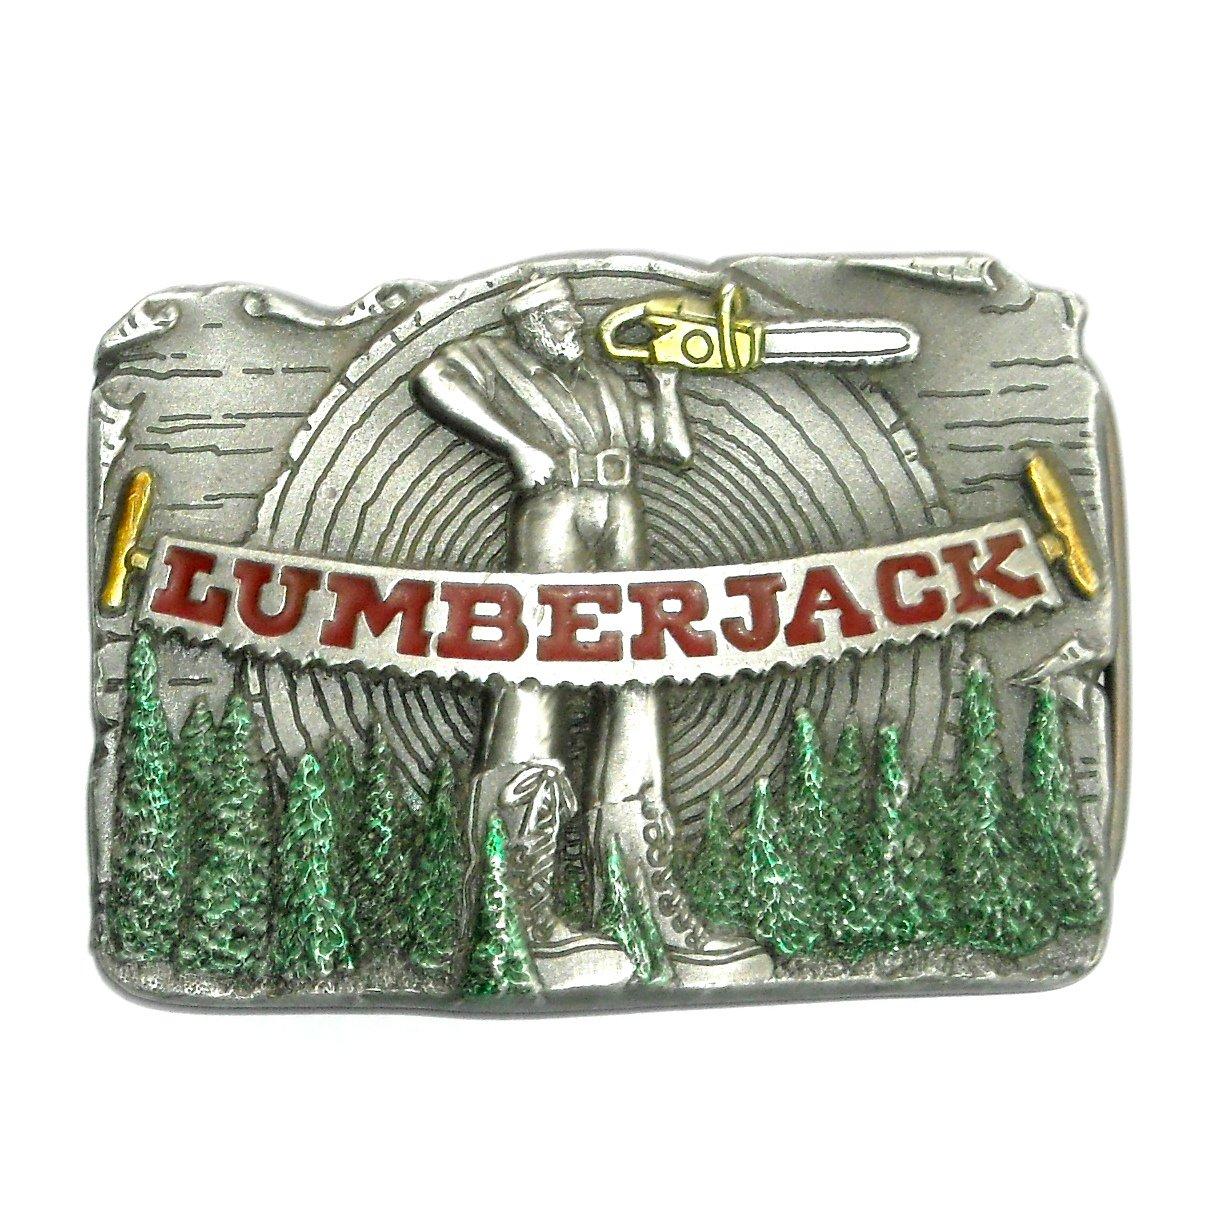 Lumberjack C&J Bergamot Color US Belt Buckle